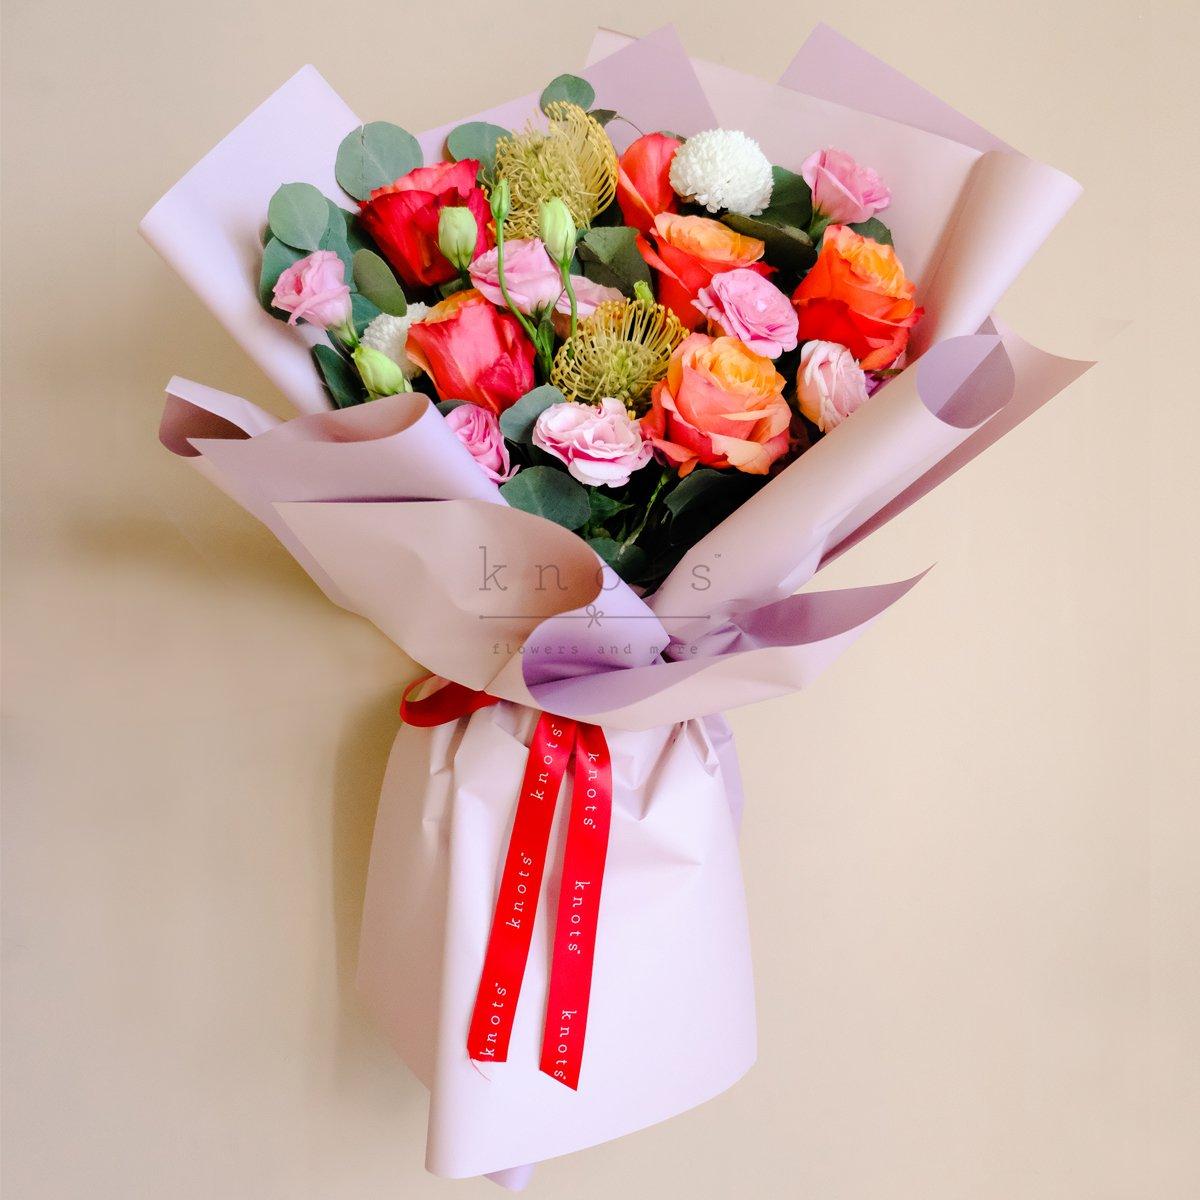 Summer Blush (Ecuadorian Roses Bouquet)